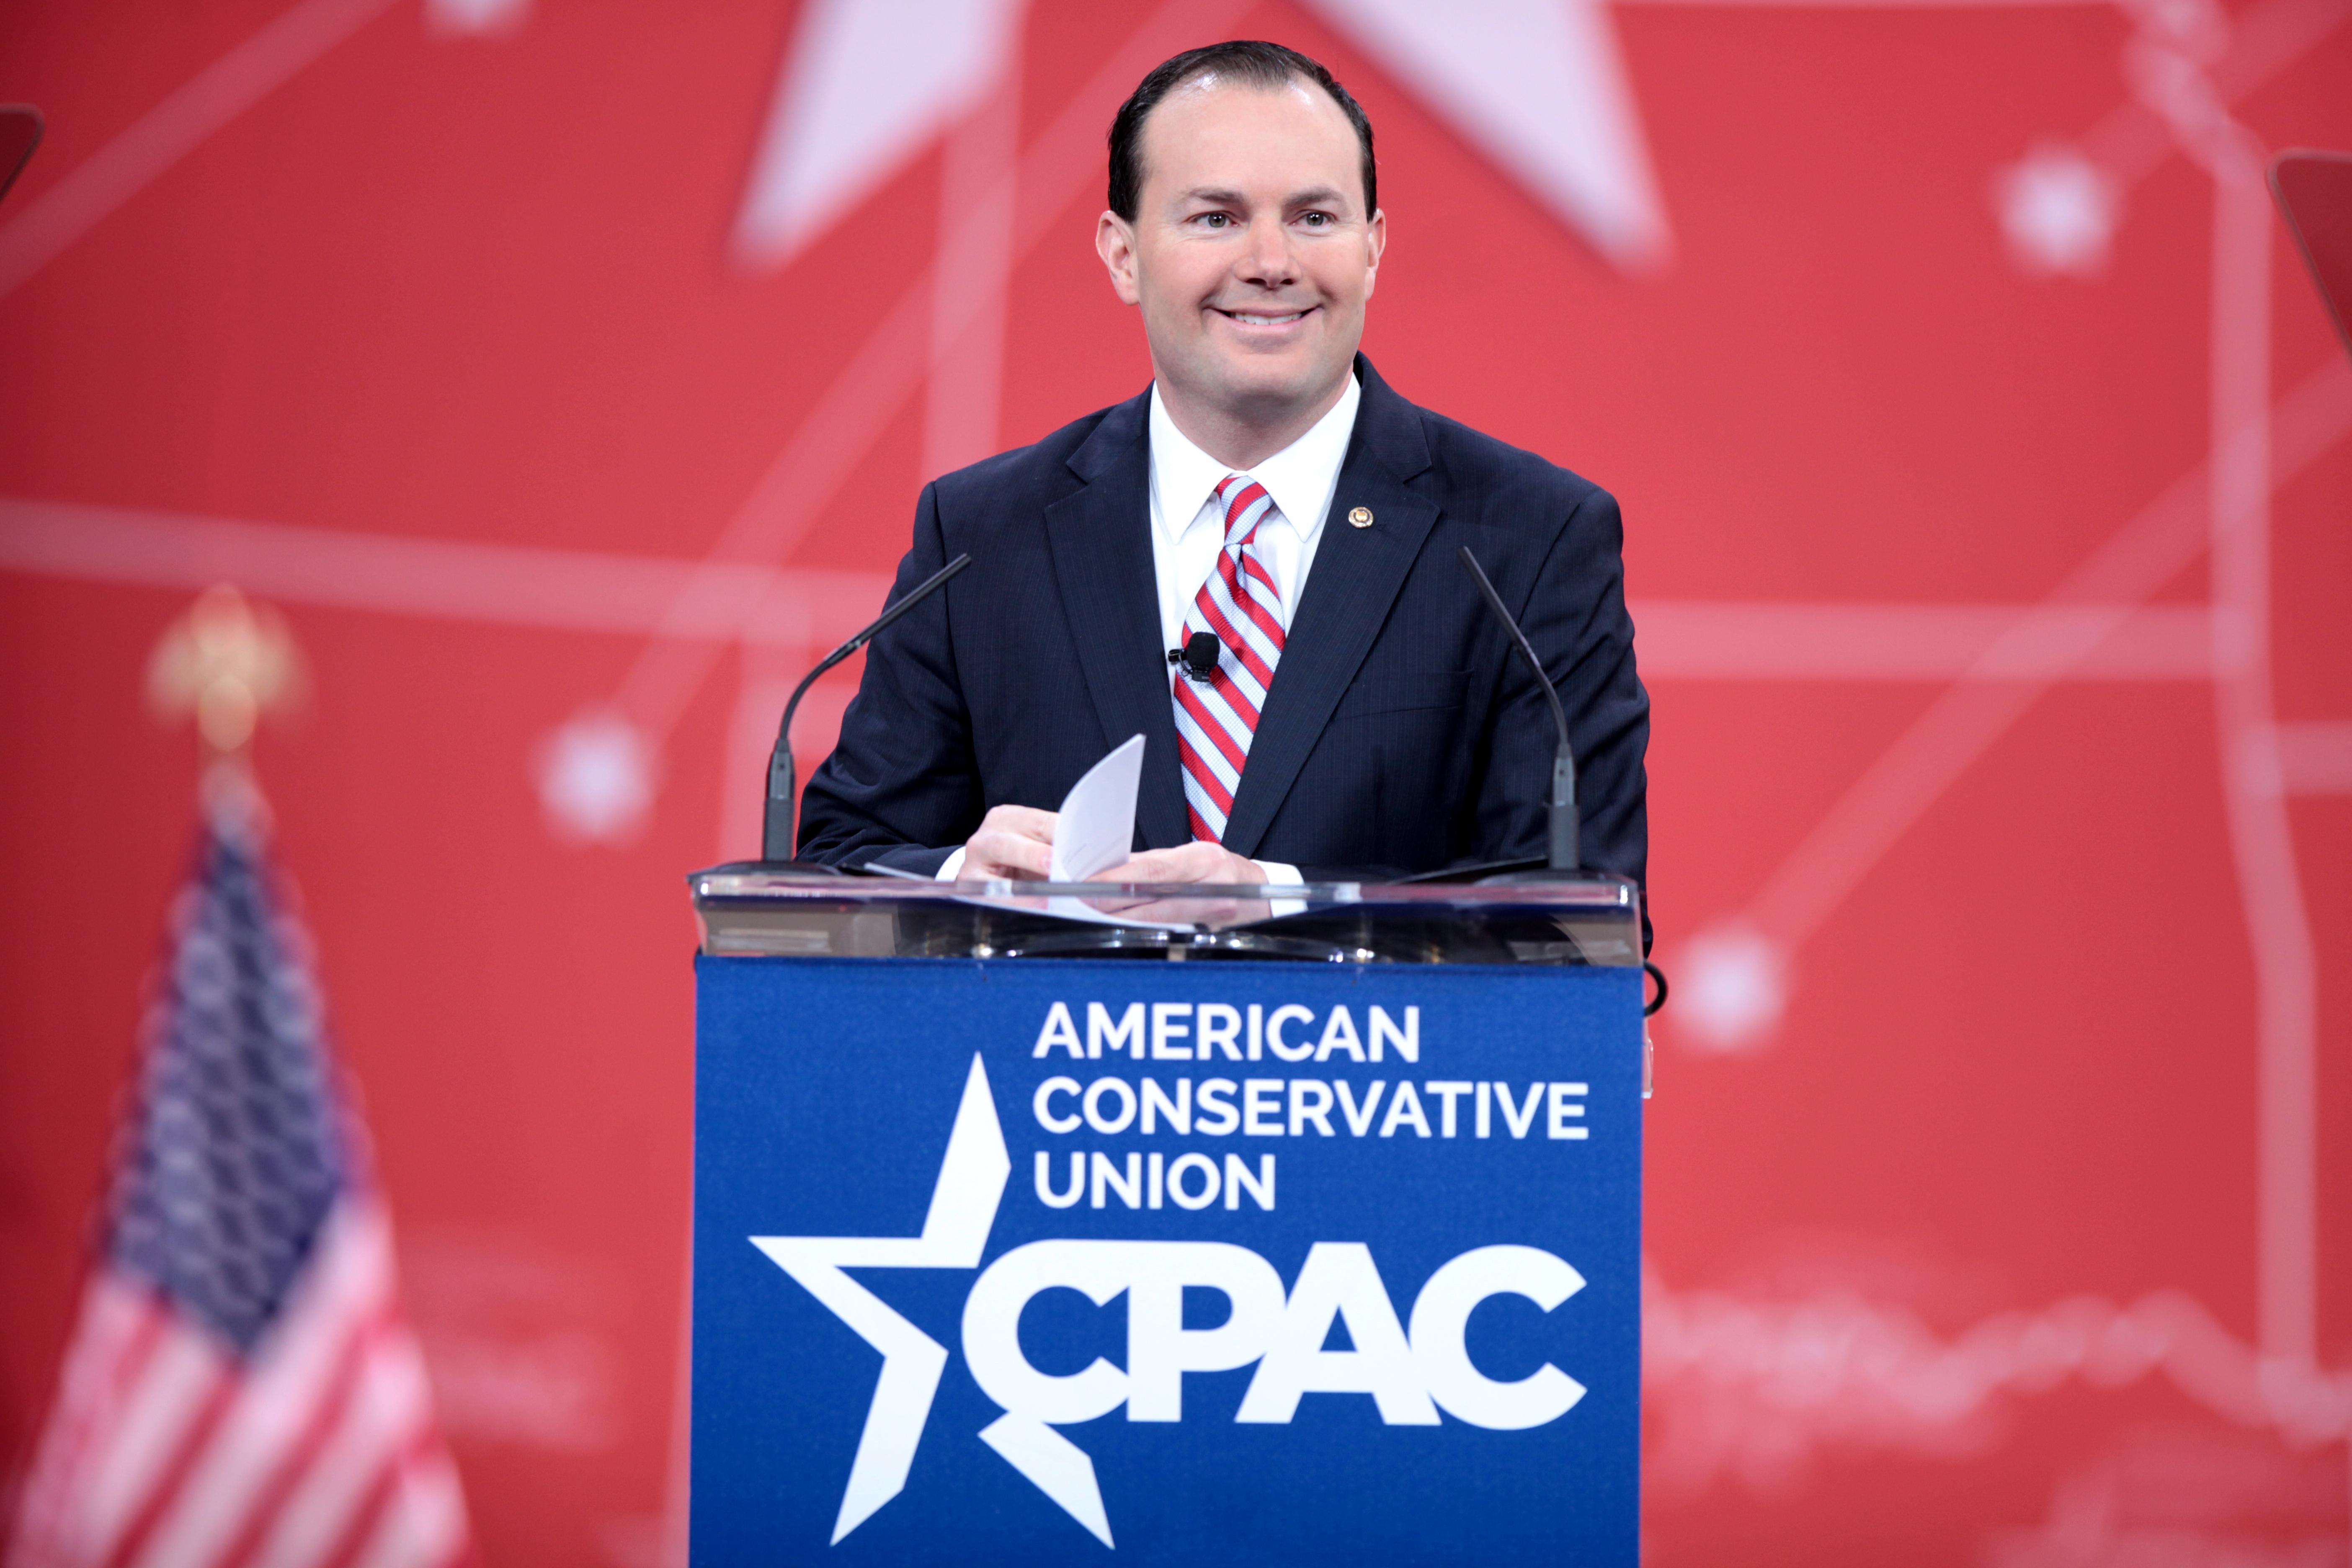 Mike Lee (U.S. politician)